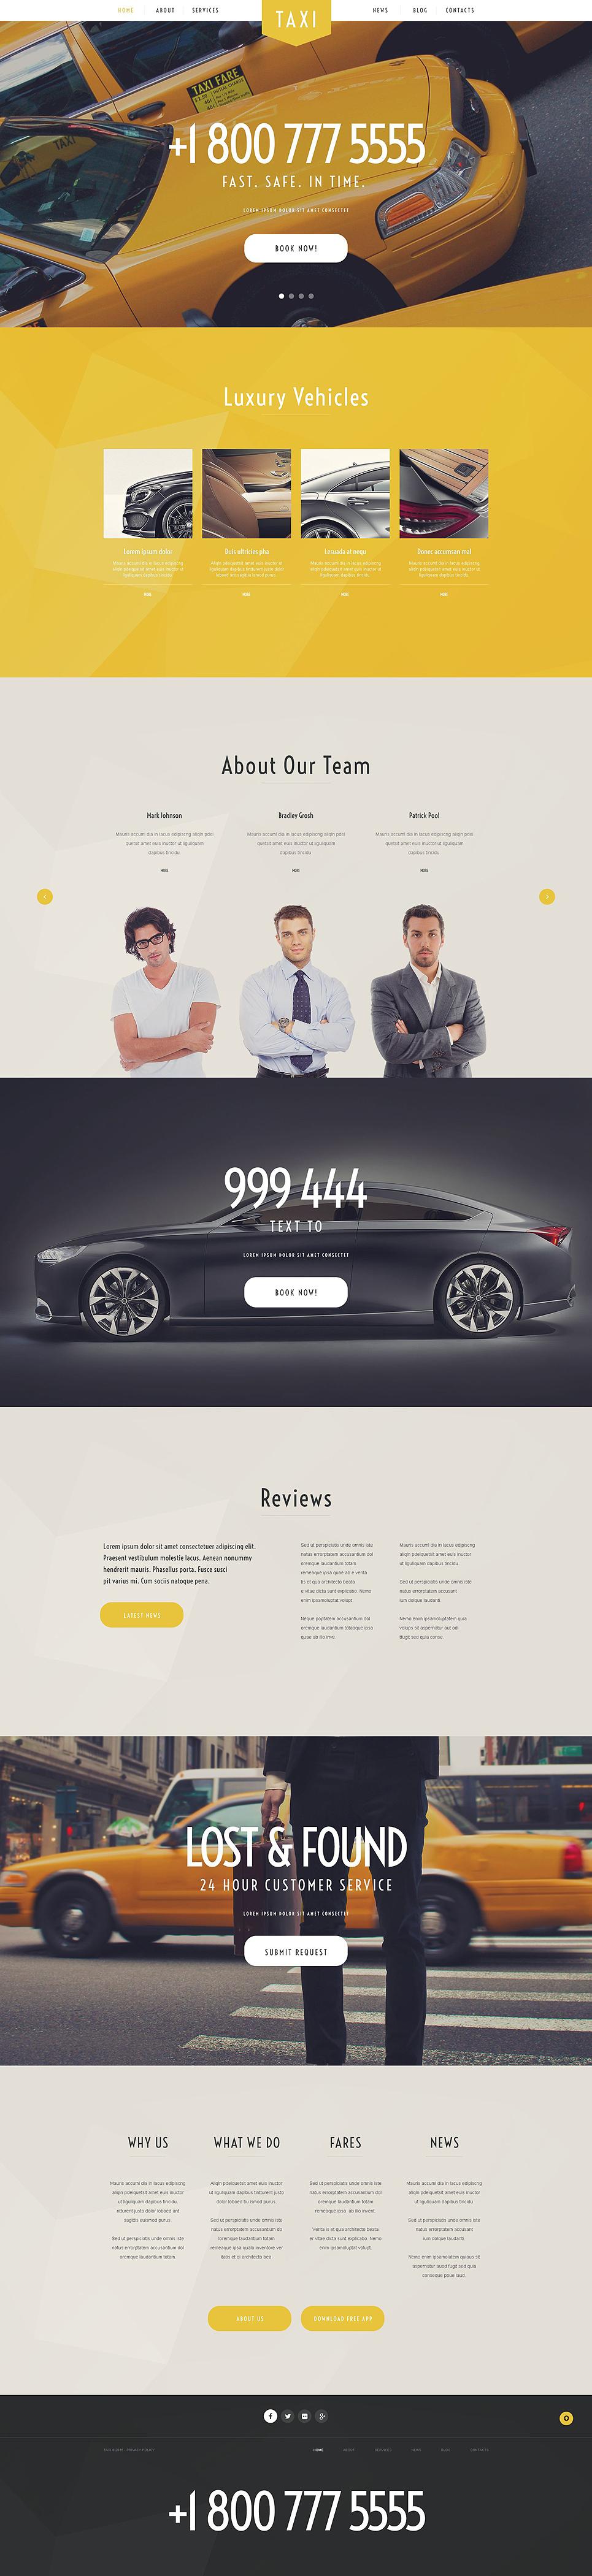 Адаптивный шаблон сайта на тему такси #54992